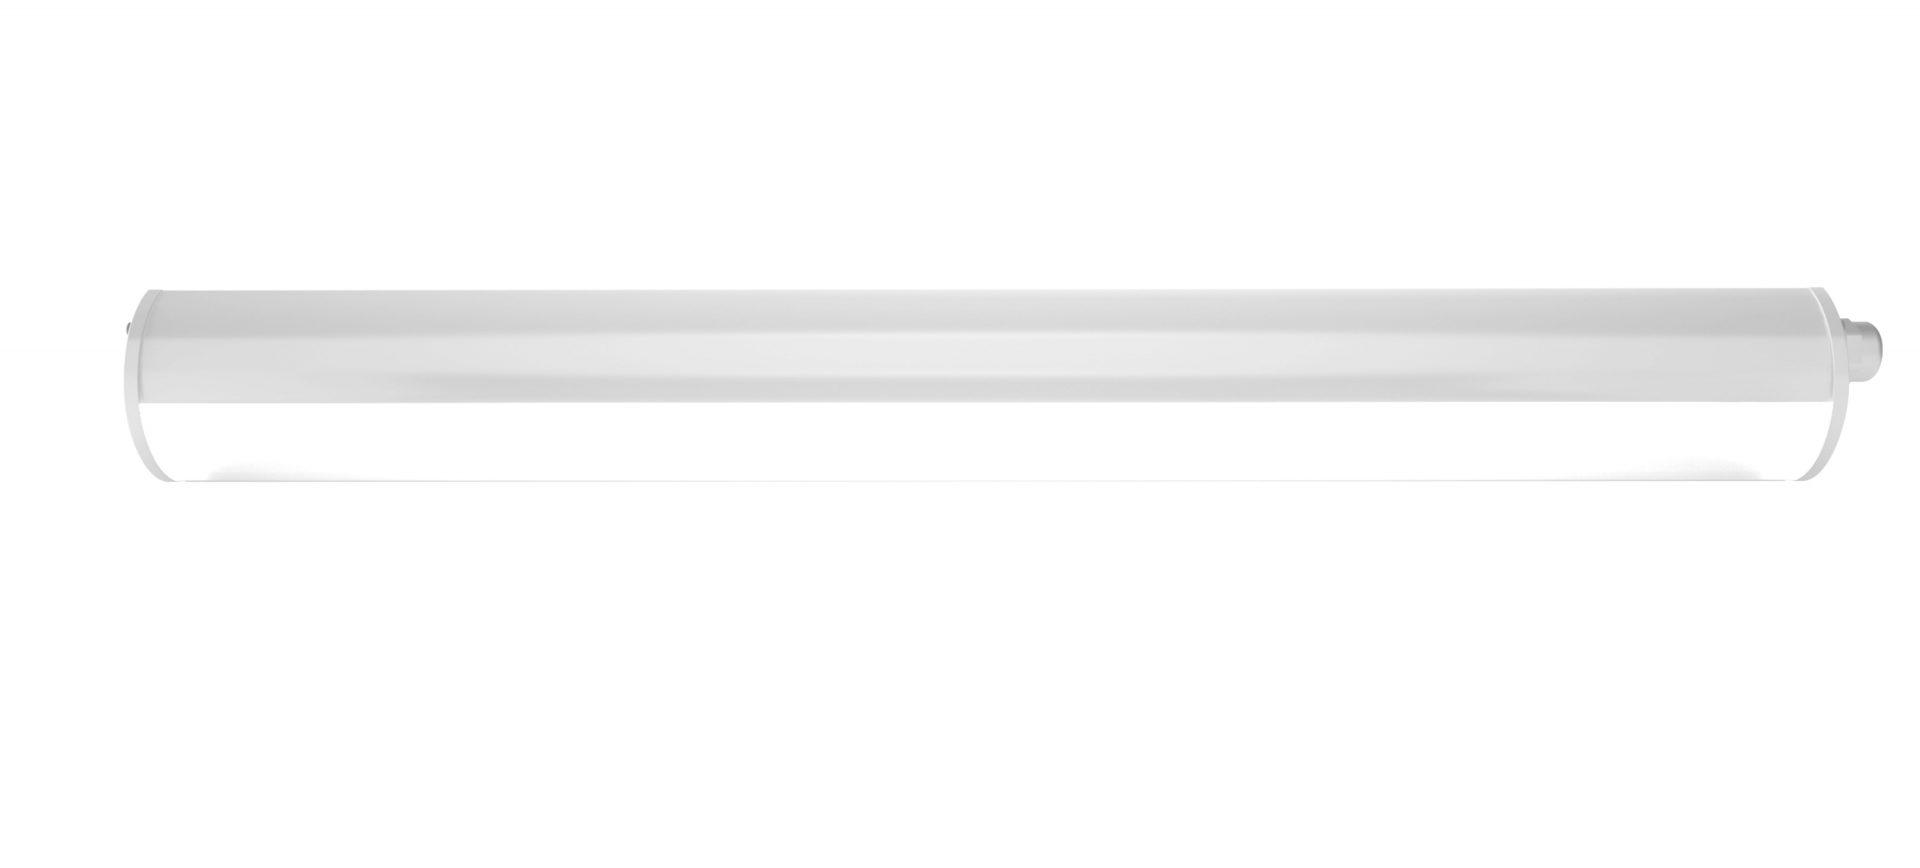 GALILEE-LED-entier_BLANC